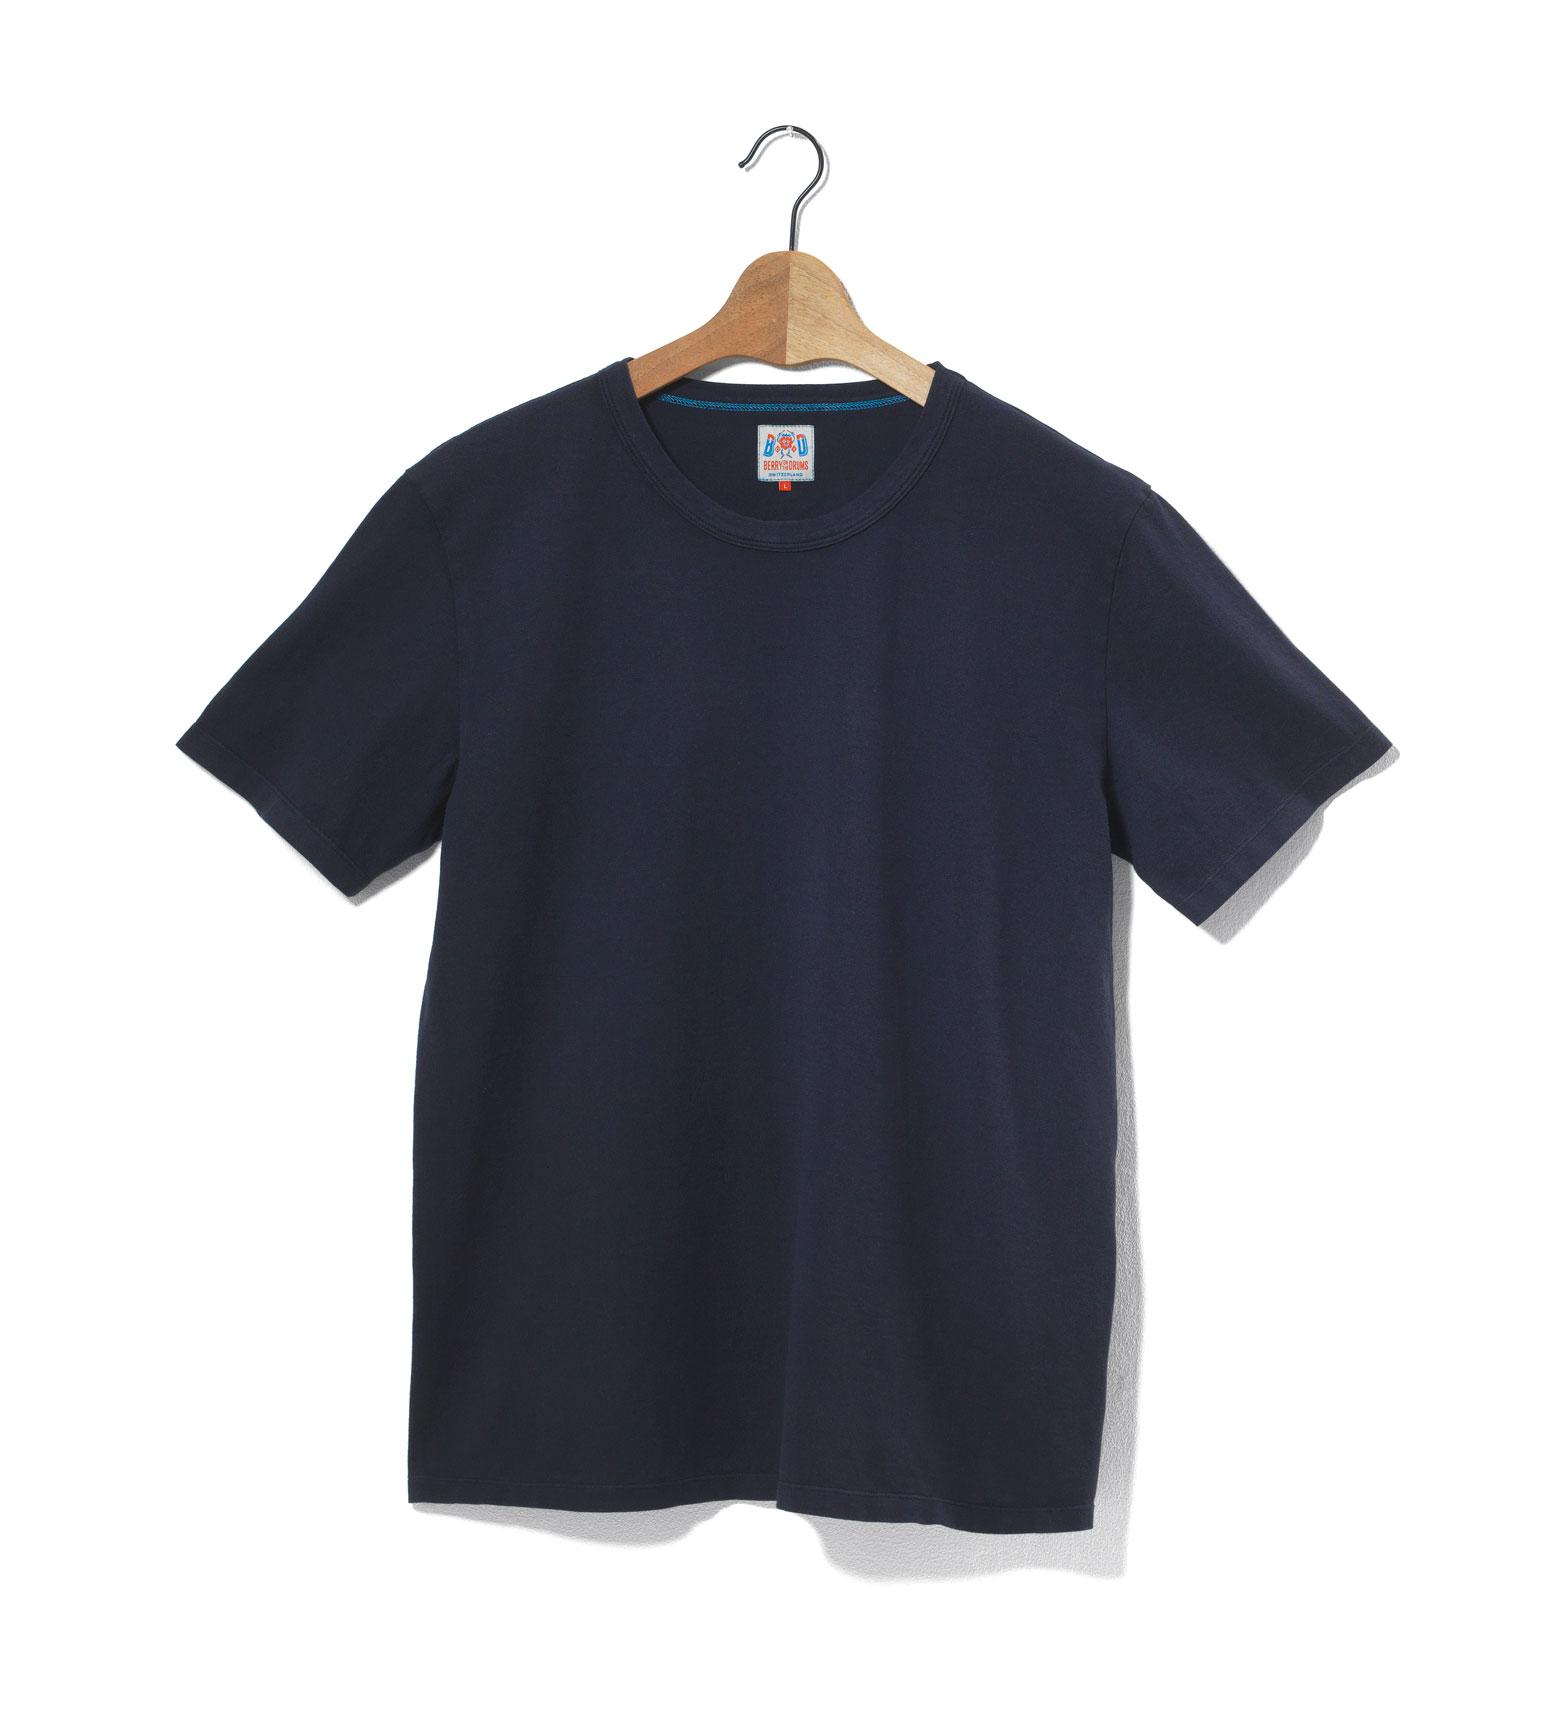 Image of Crew Neck Tee Single Jersey